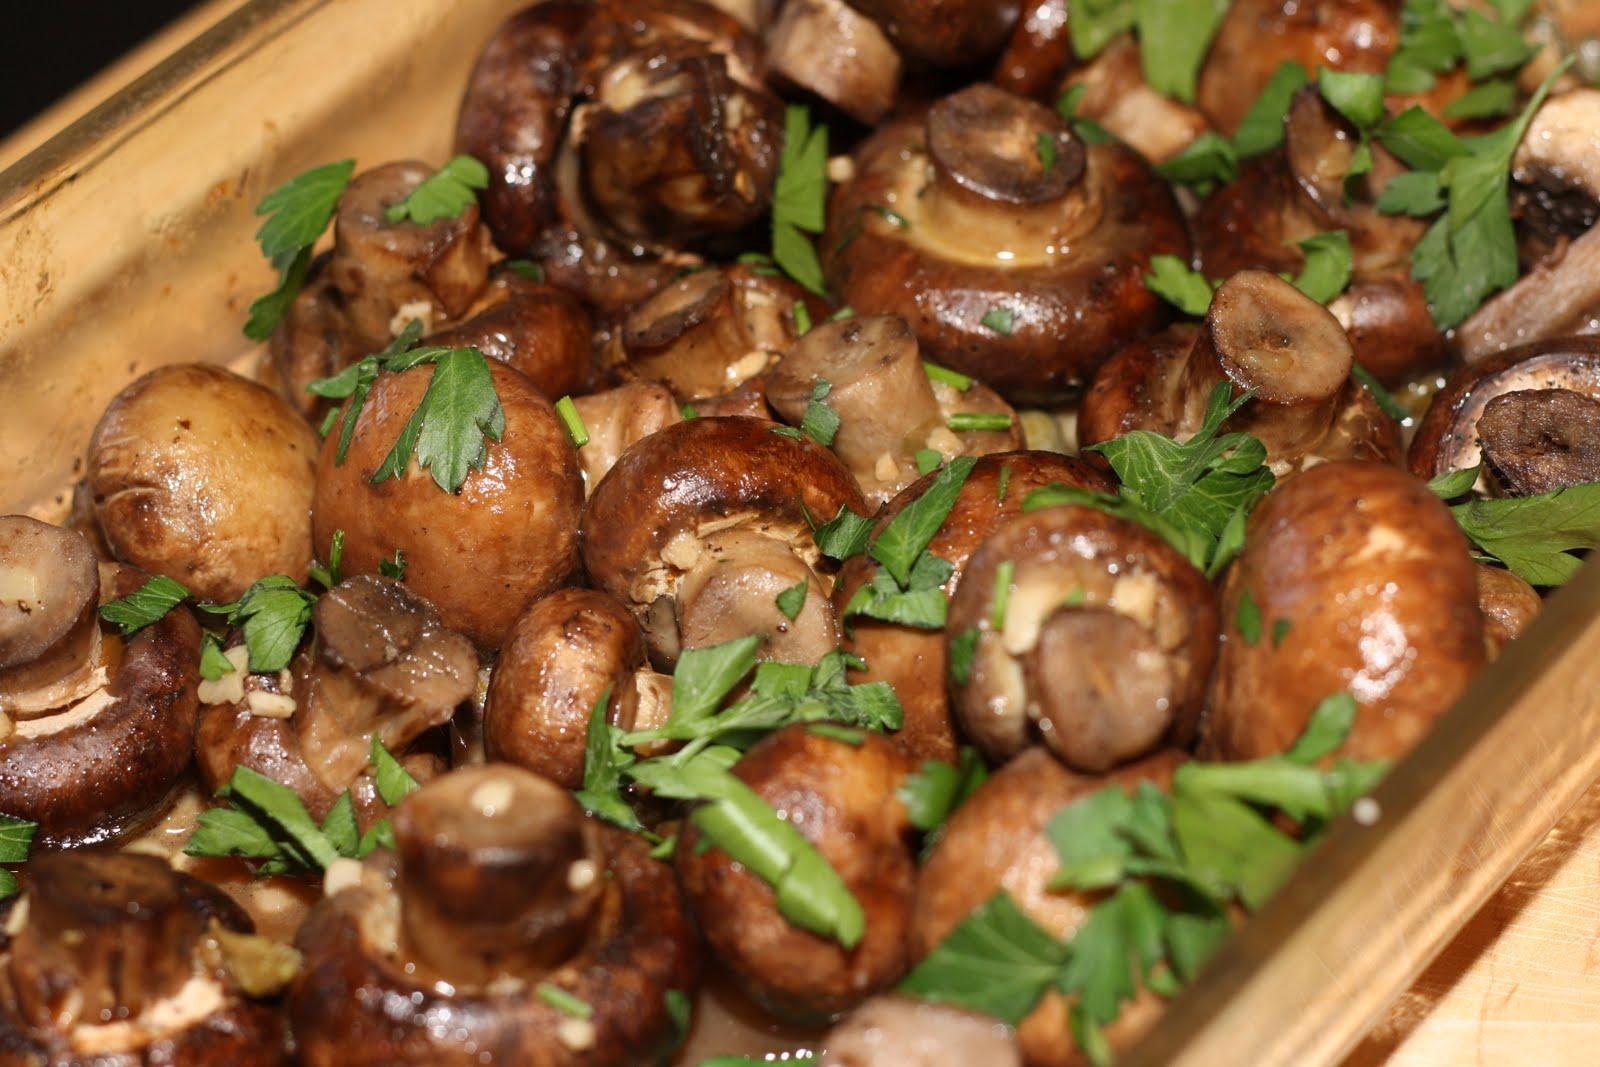 The Bitchin' Kitchin': Garlic Butter Roasted Mushrooms